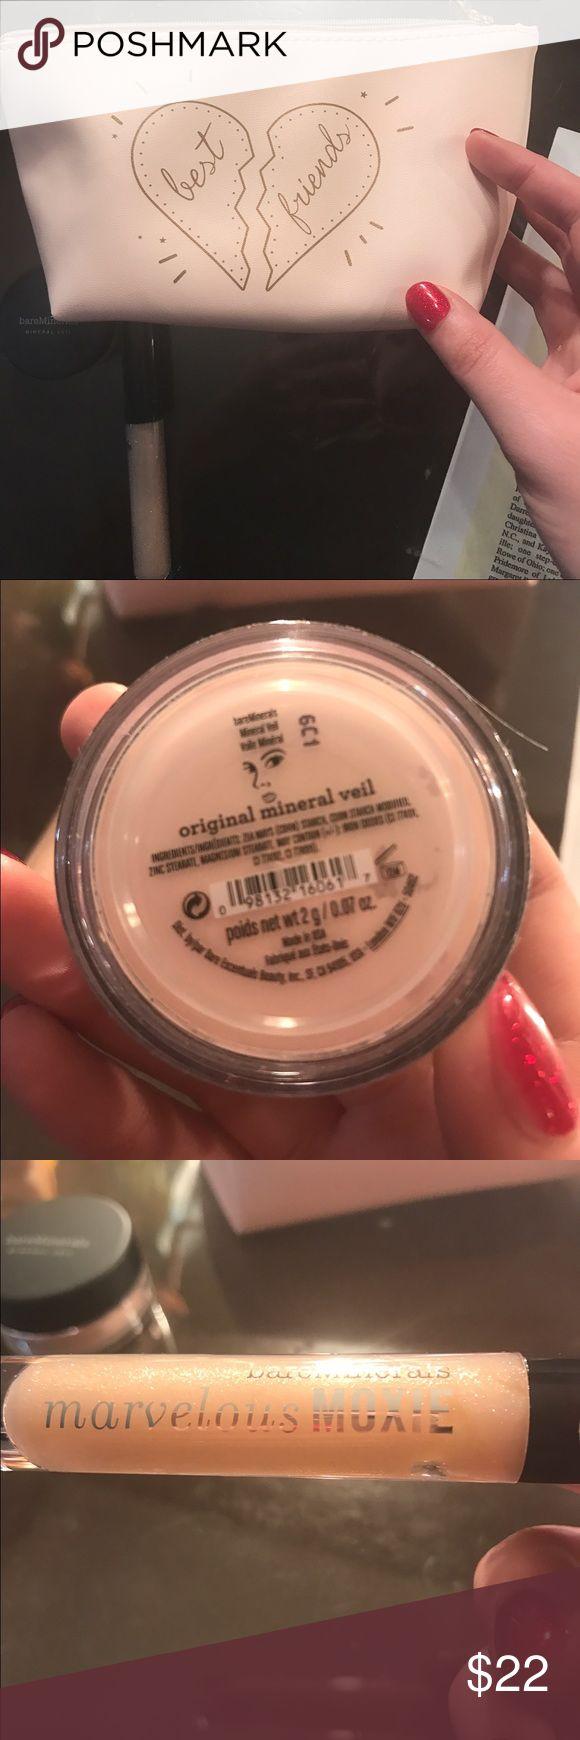 "Bare Minerals set Cute pink travel bag with brand new Mineral Veil & ""Best Friend"" gloss bareMinerals Makeup"